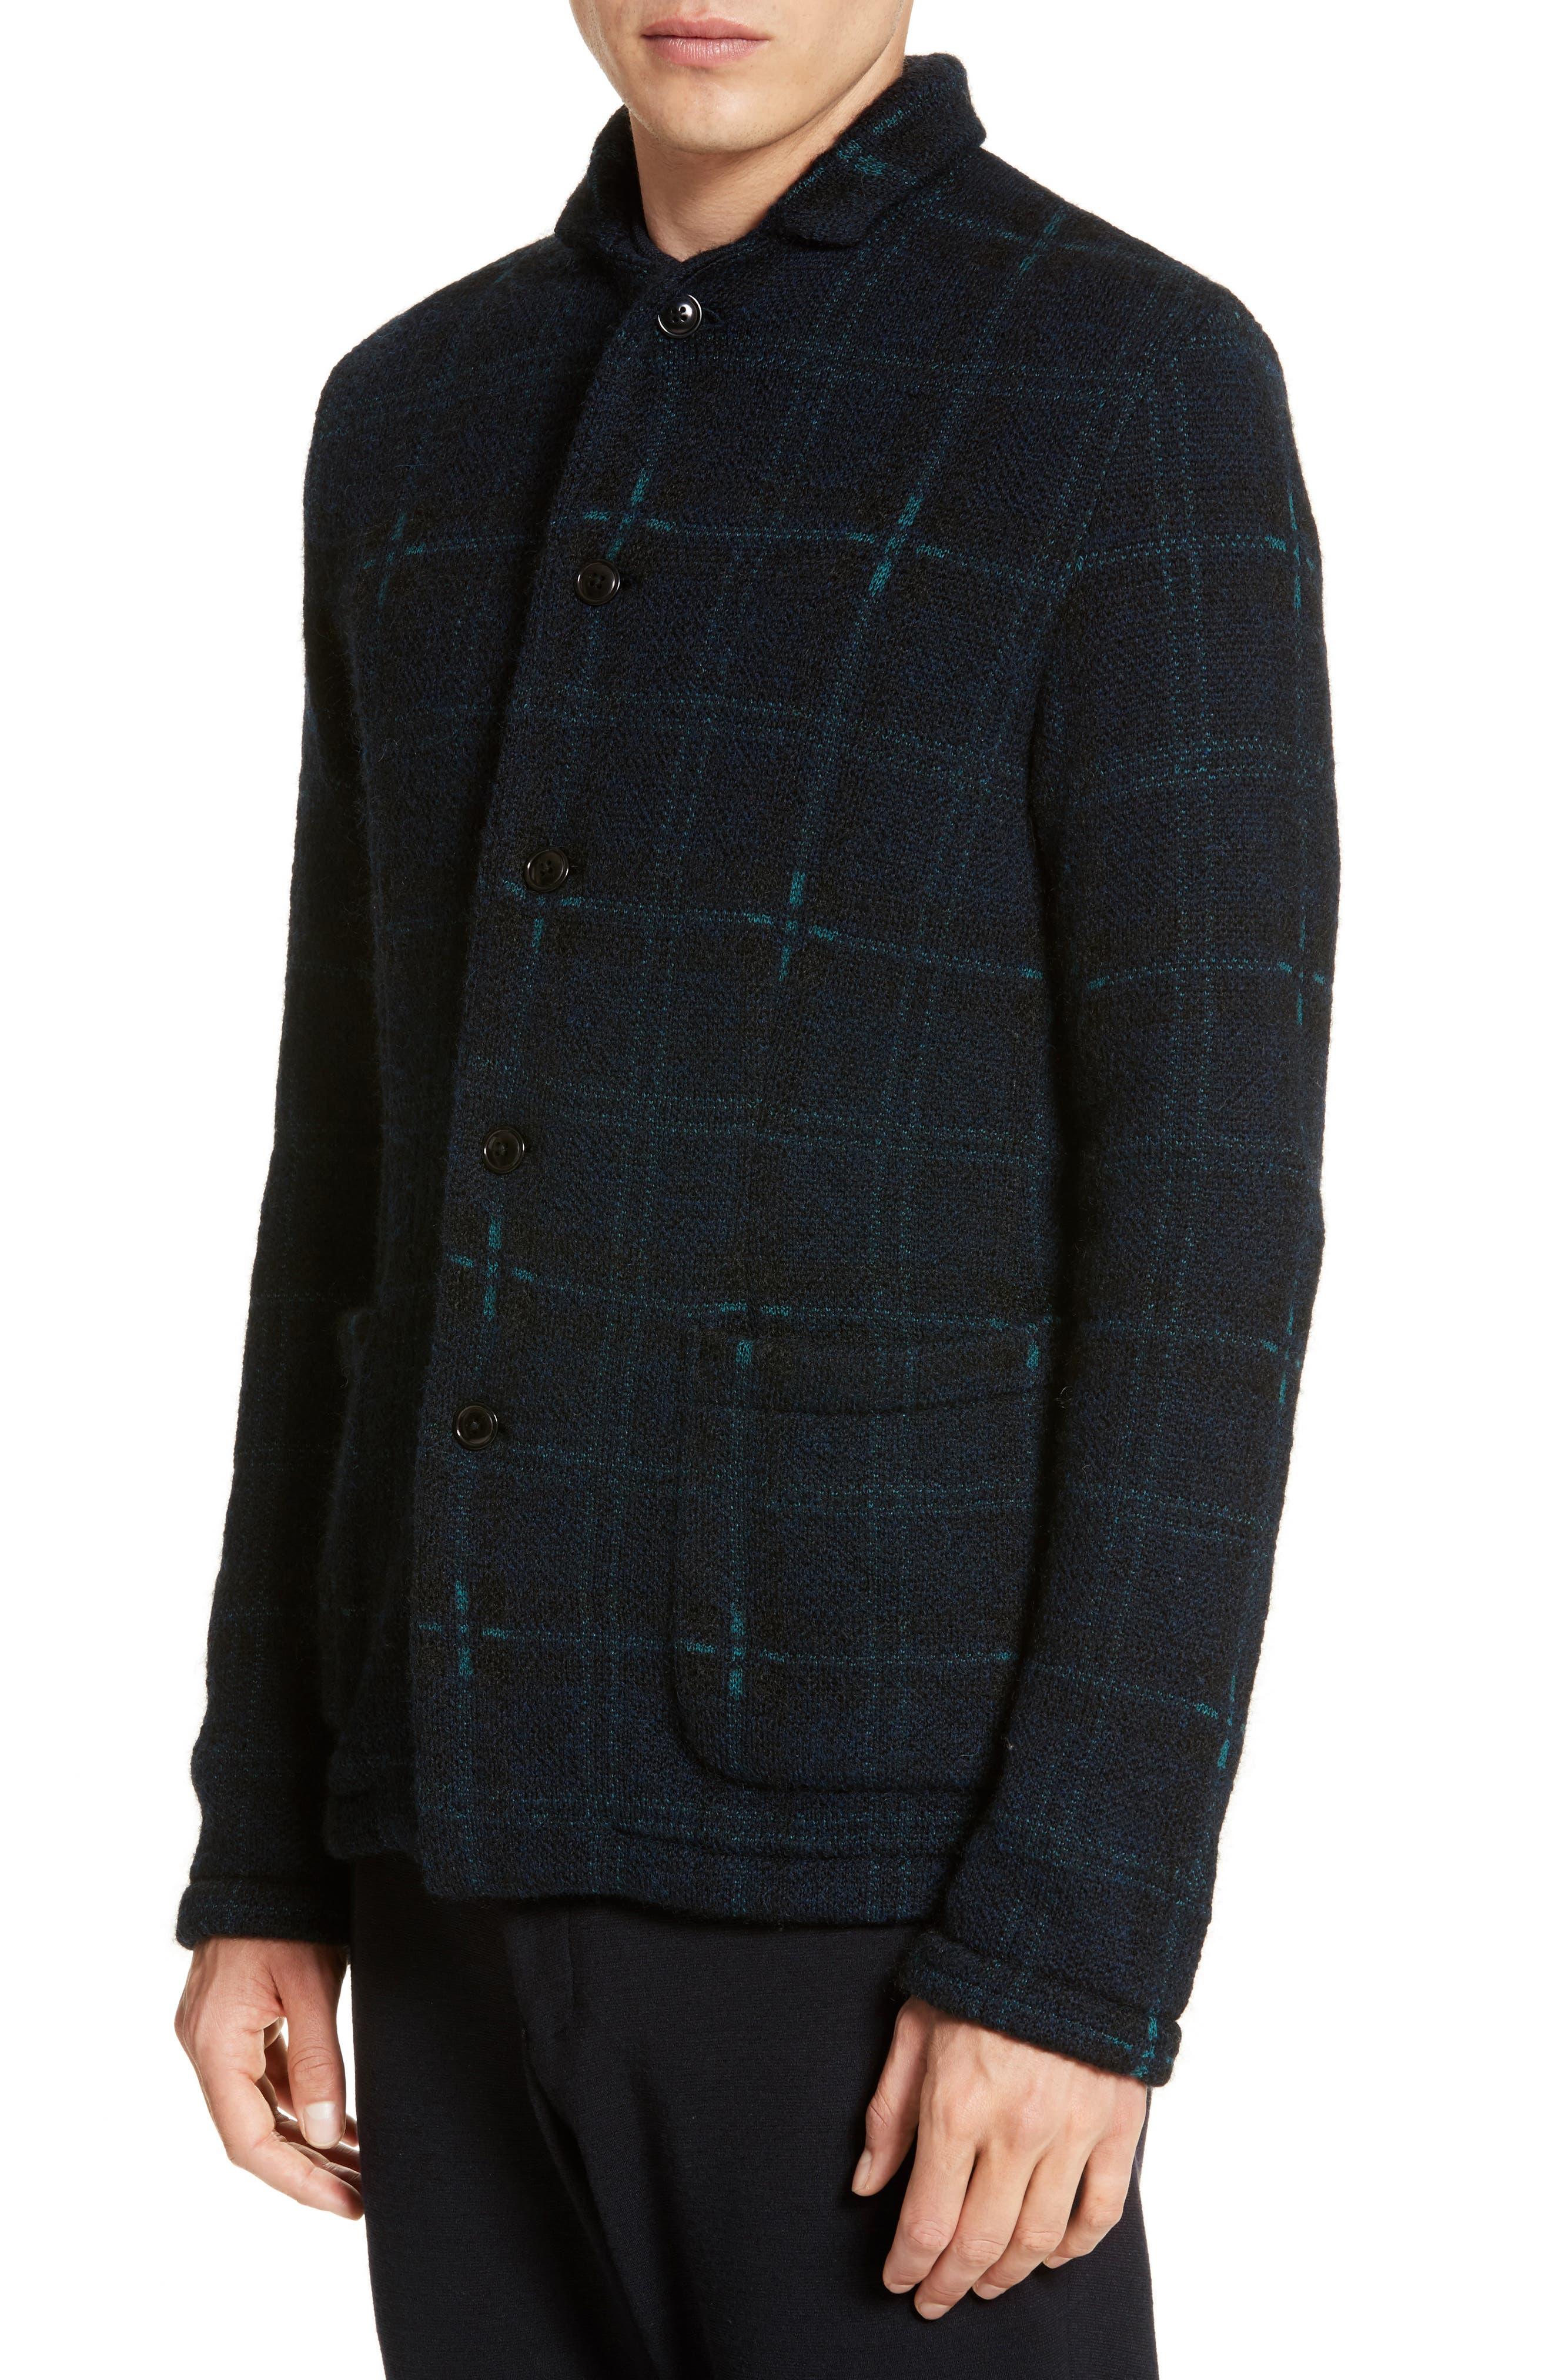 Wool Blend Knit Sportcoat,                             Alternate thumbnail 4, color,                             Navy